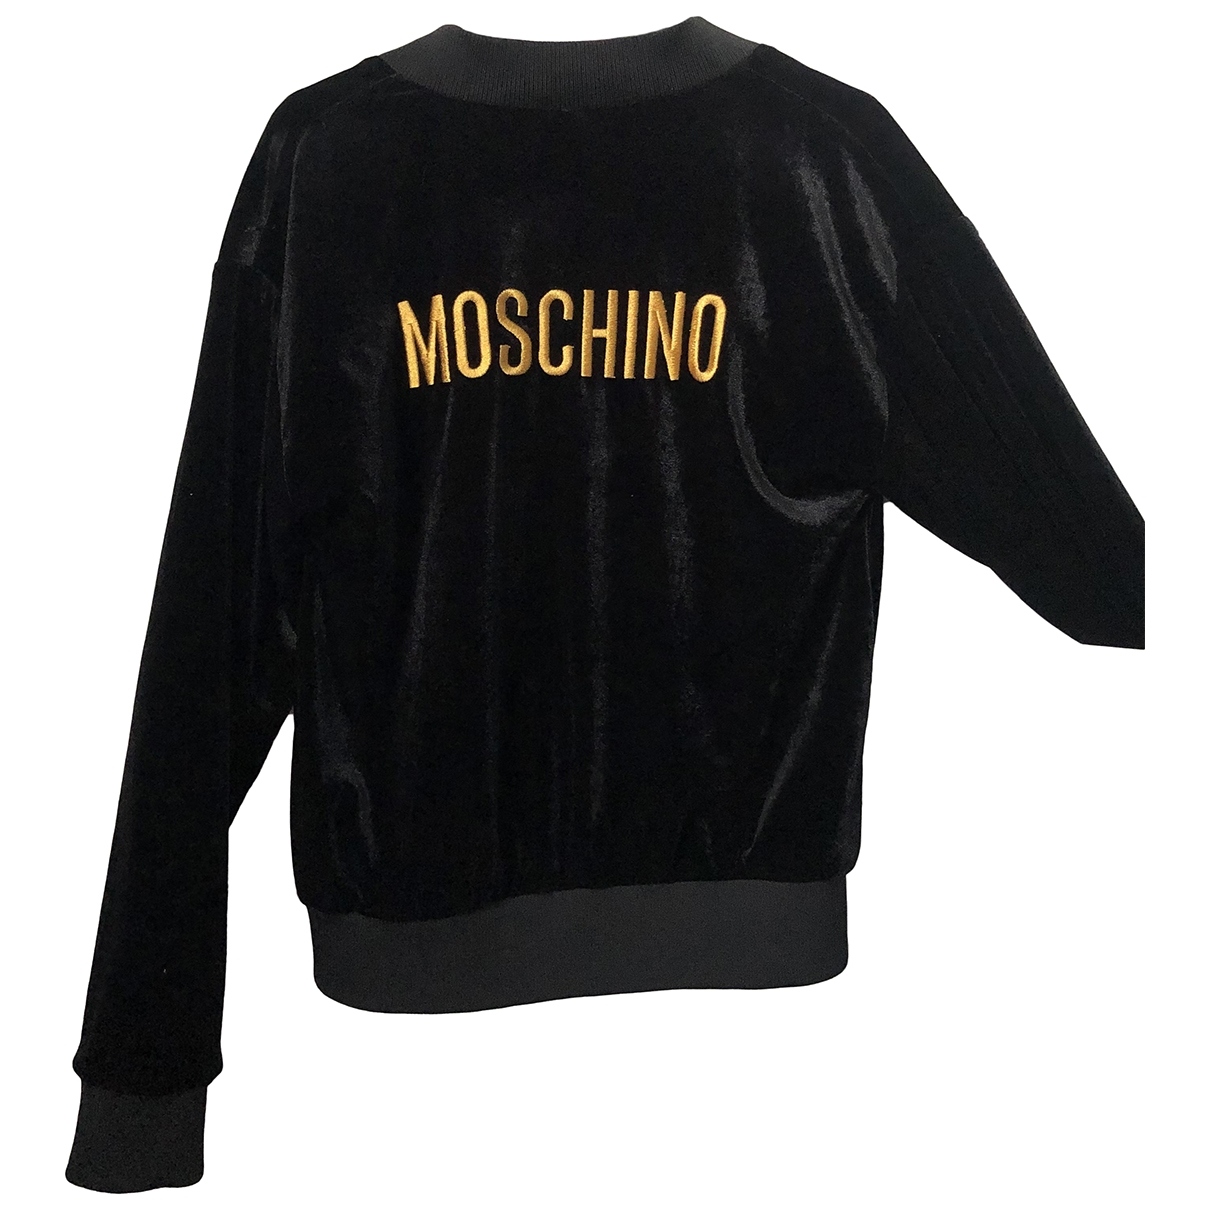 Moschino - Pull   pour enfant - noir